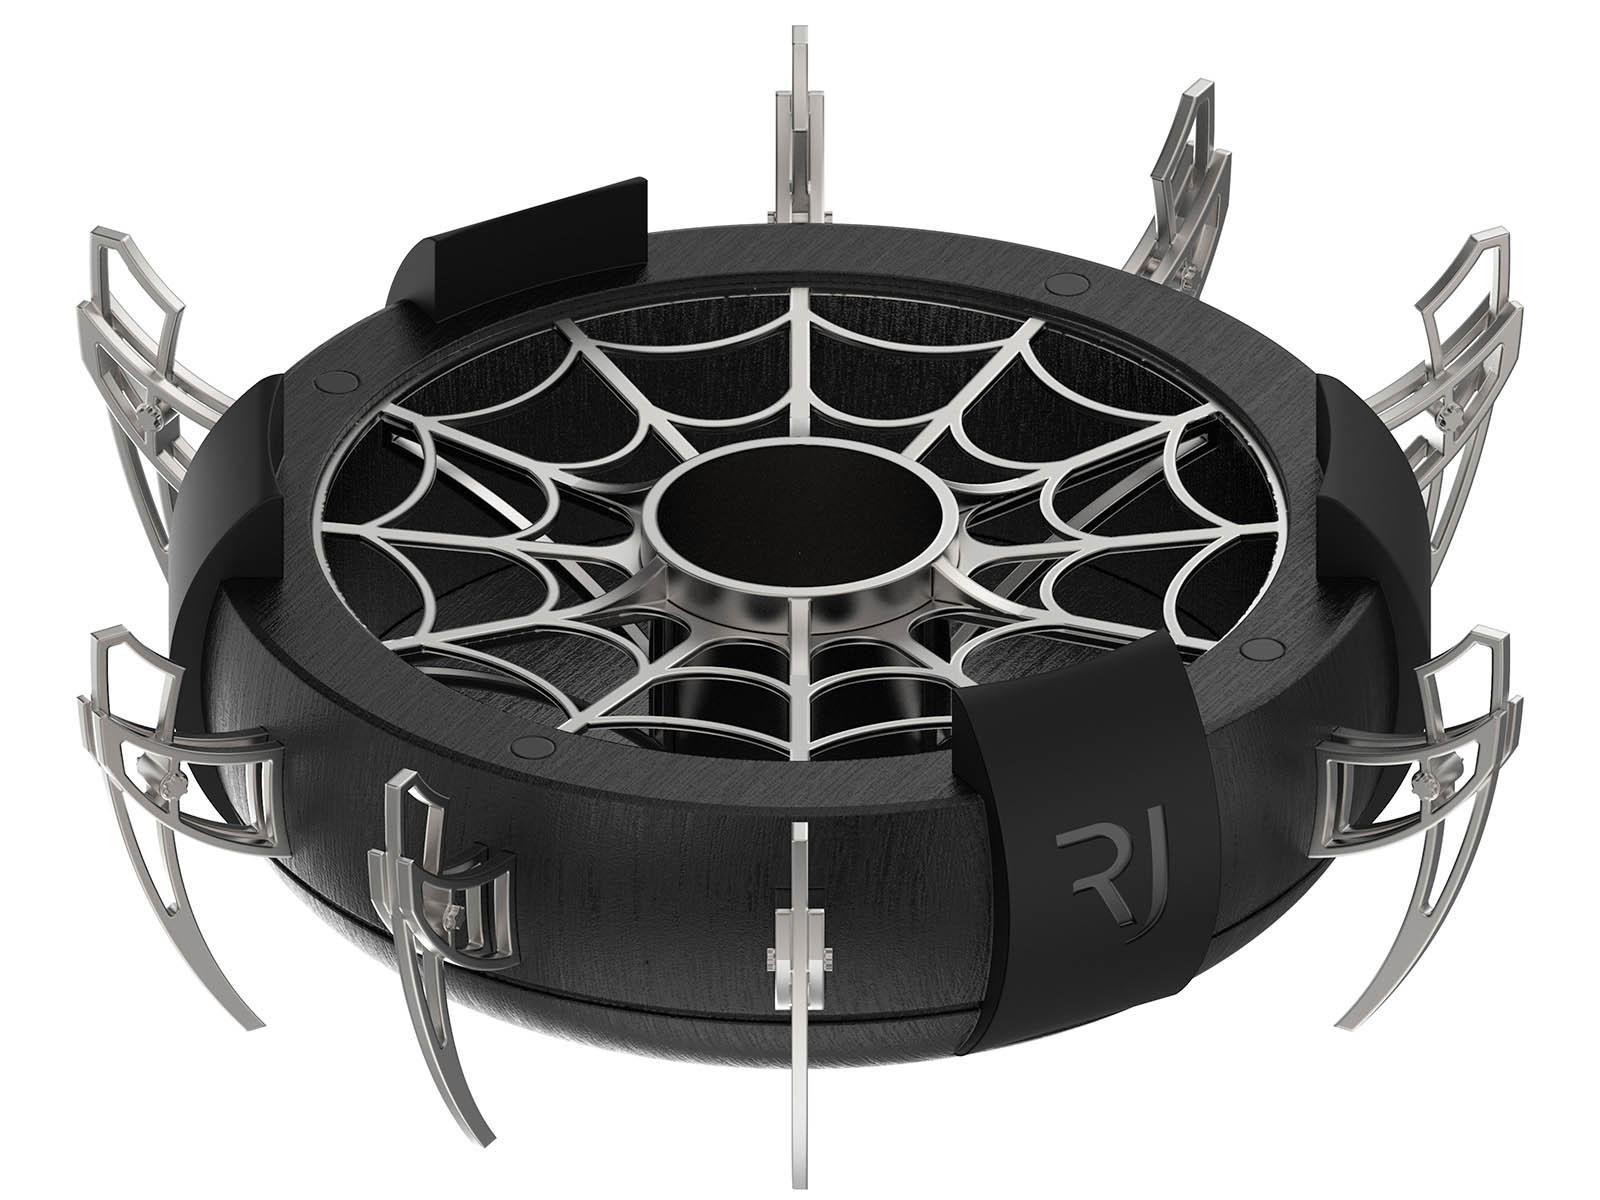 rj-arraw-spider-man-stealth-tourbillon-2.jpg